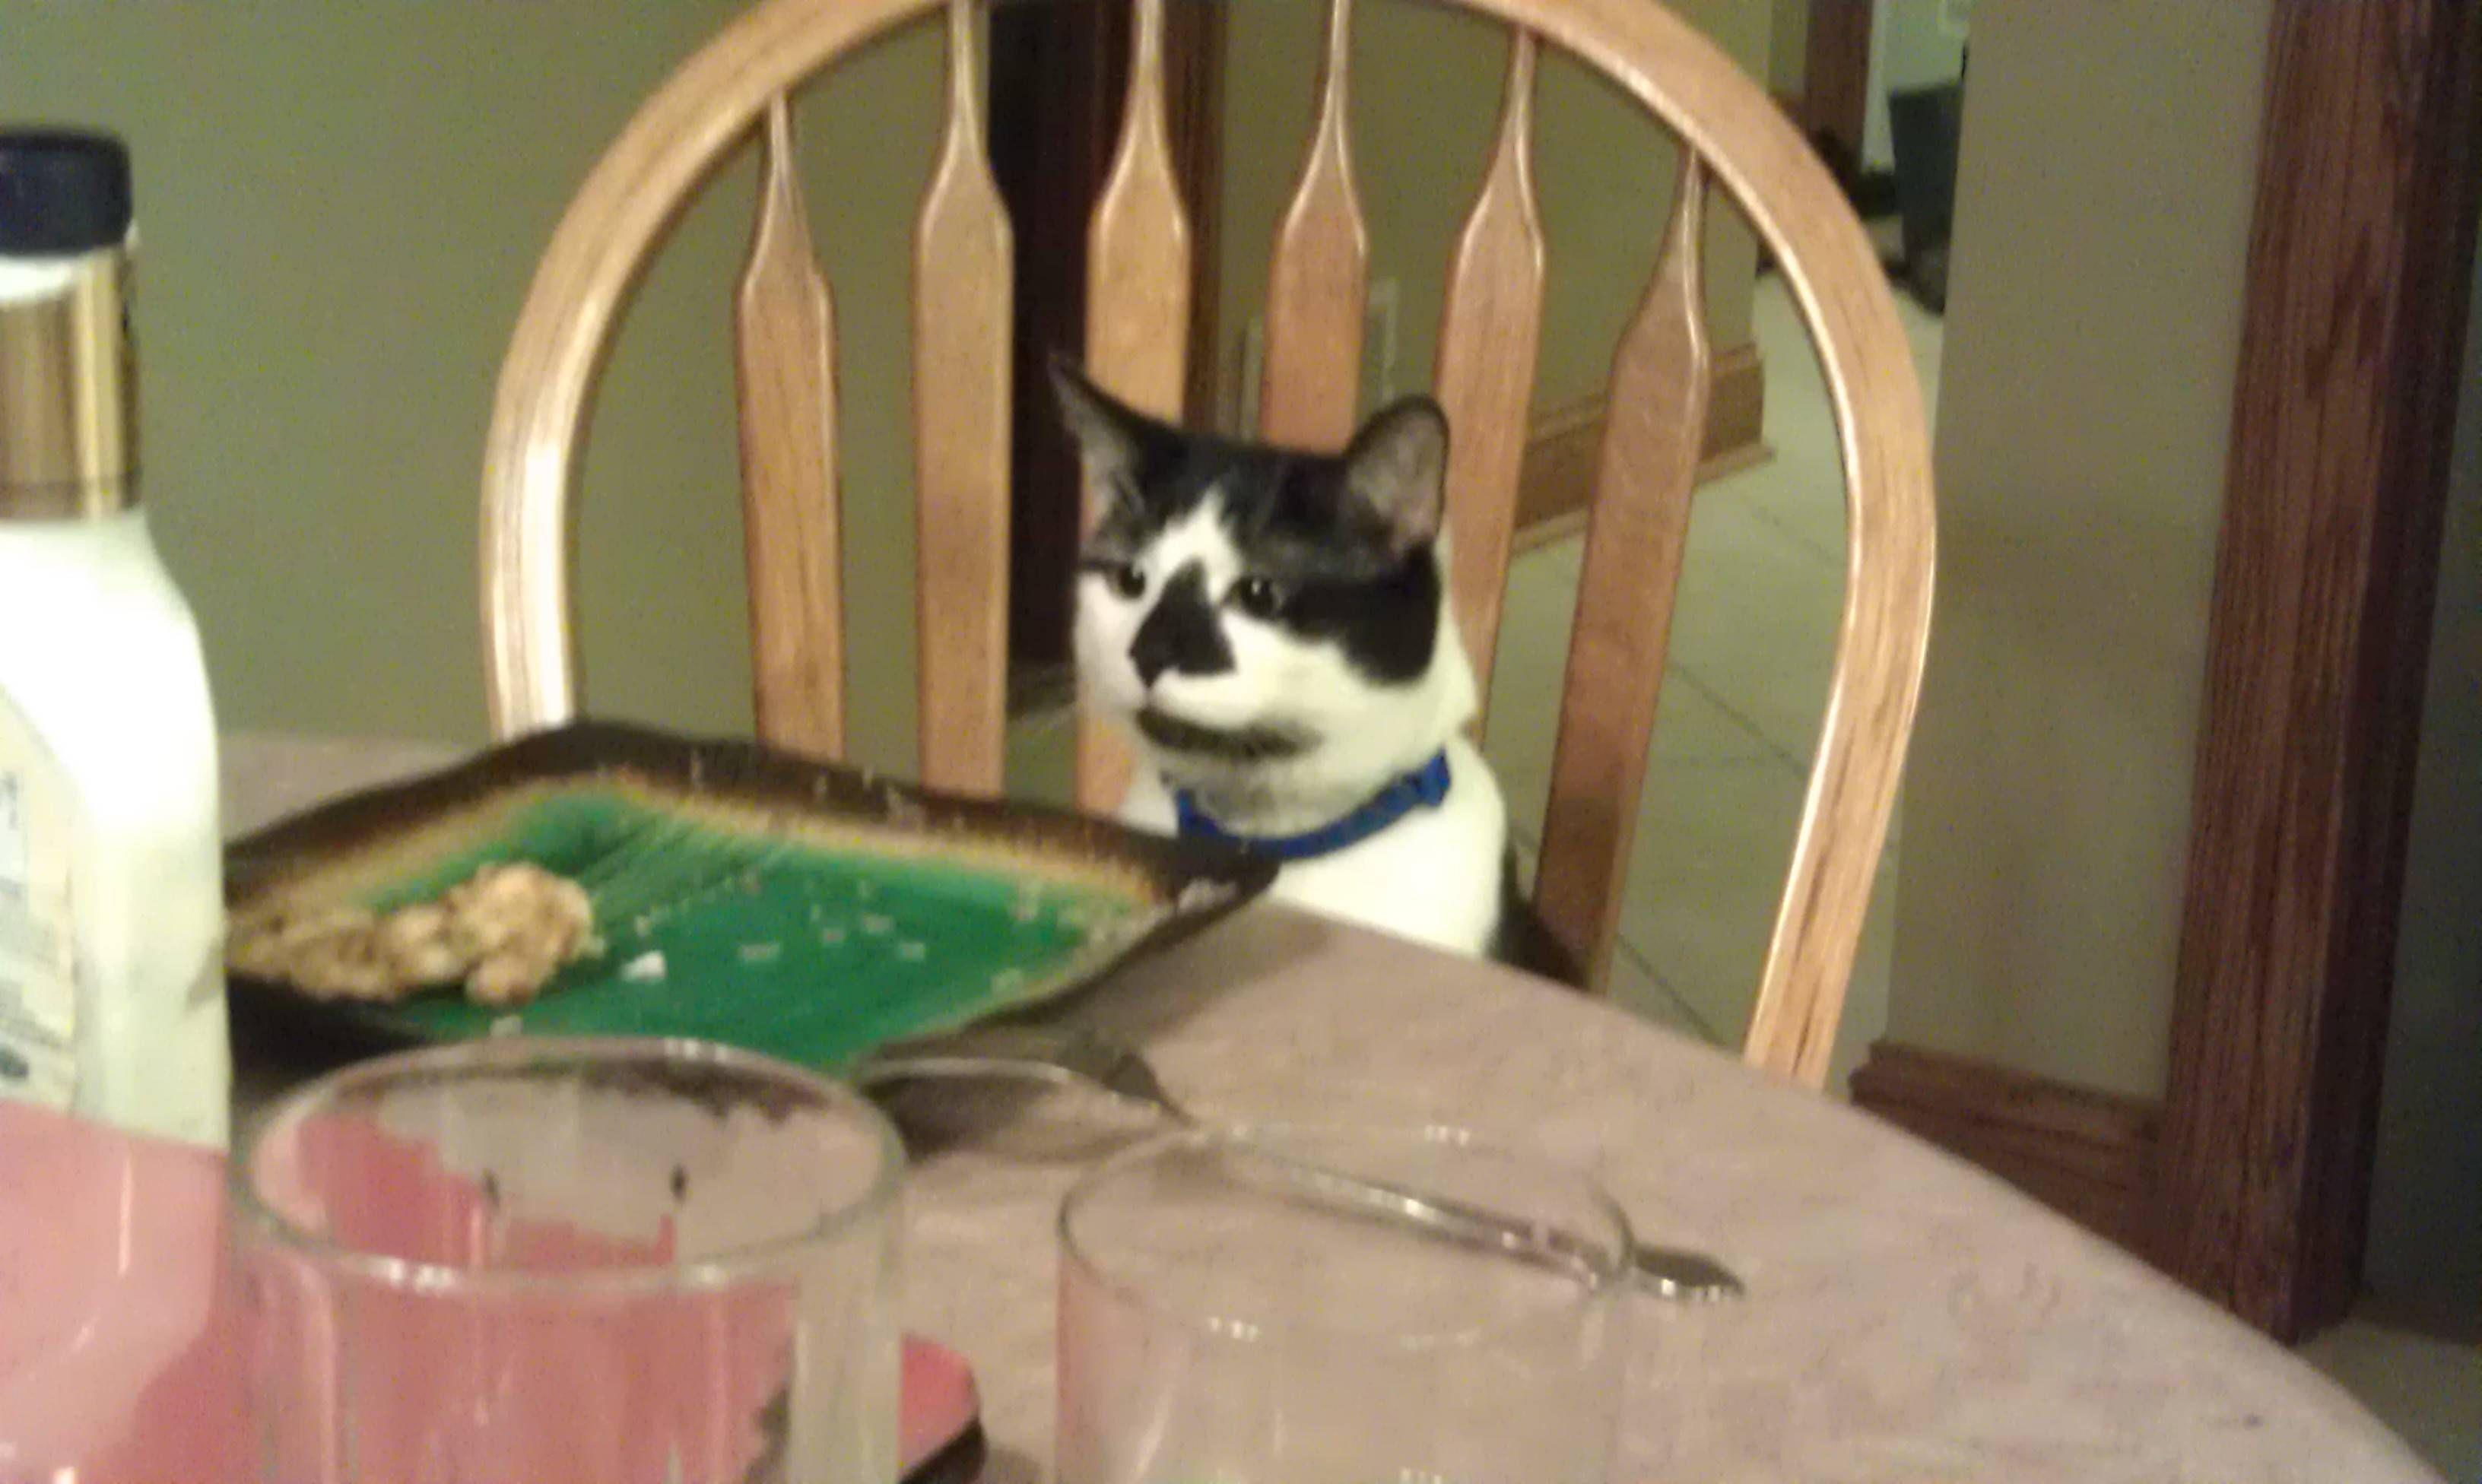 Sammy is ready for dinner!